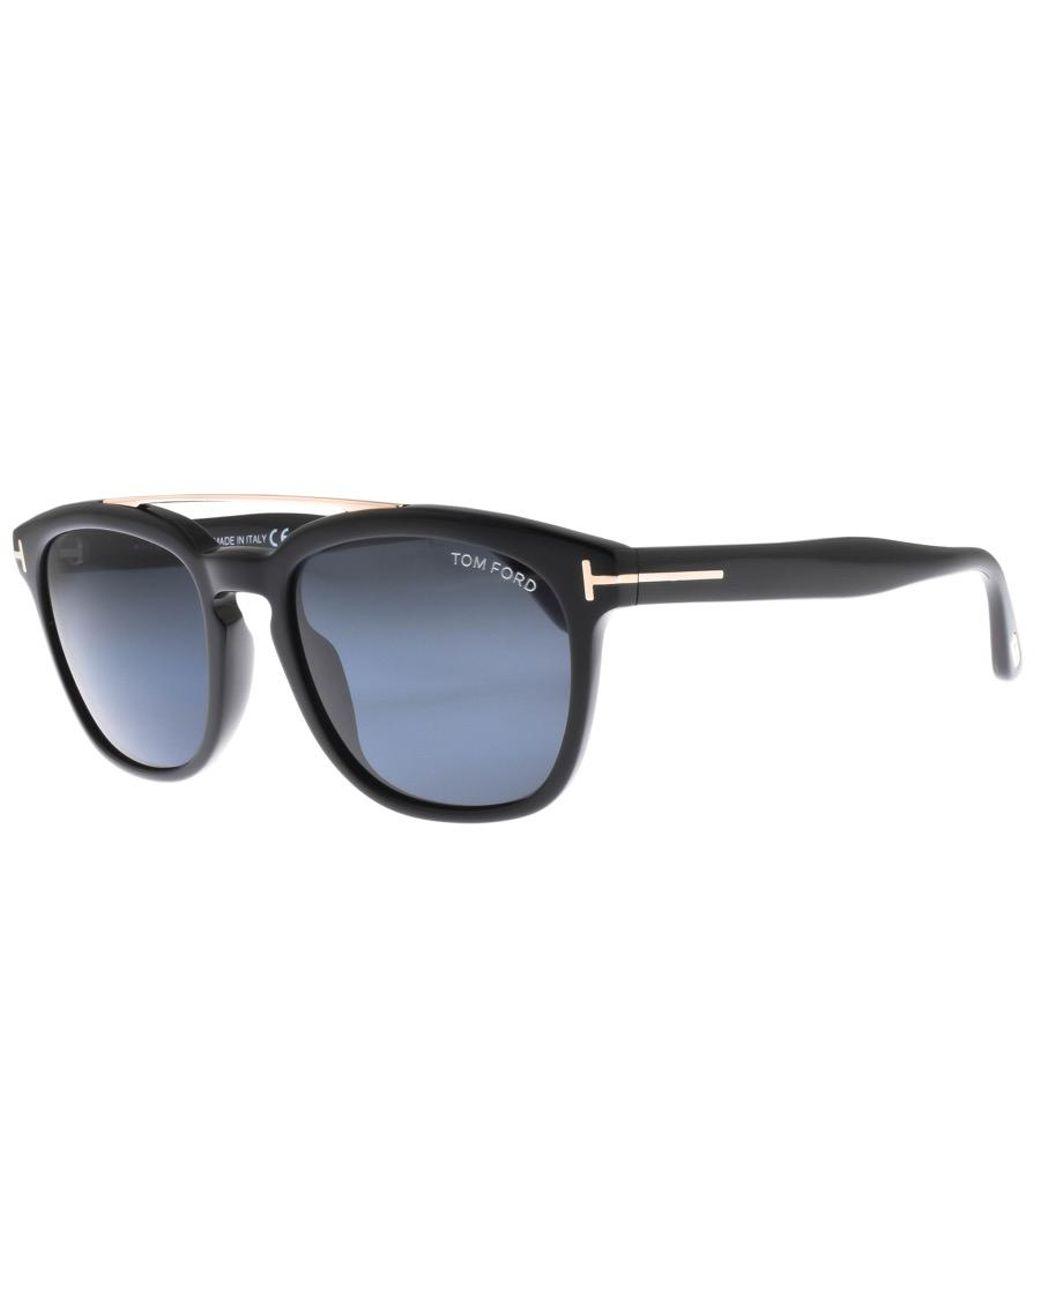 5cfaa18681ef Lyst - Tom Ford Holt Sunglasses Black in Black for Men